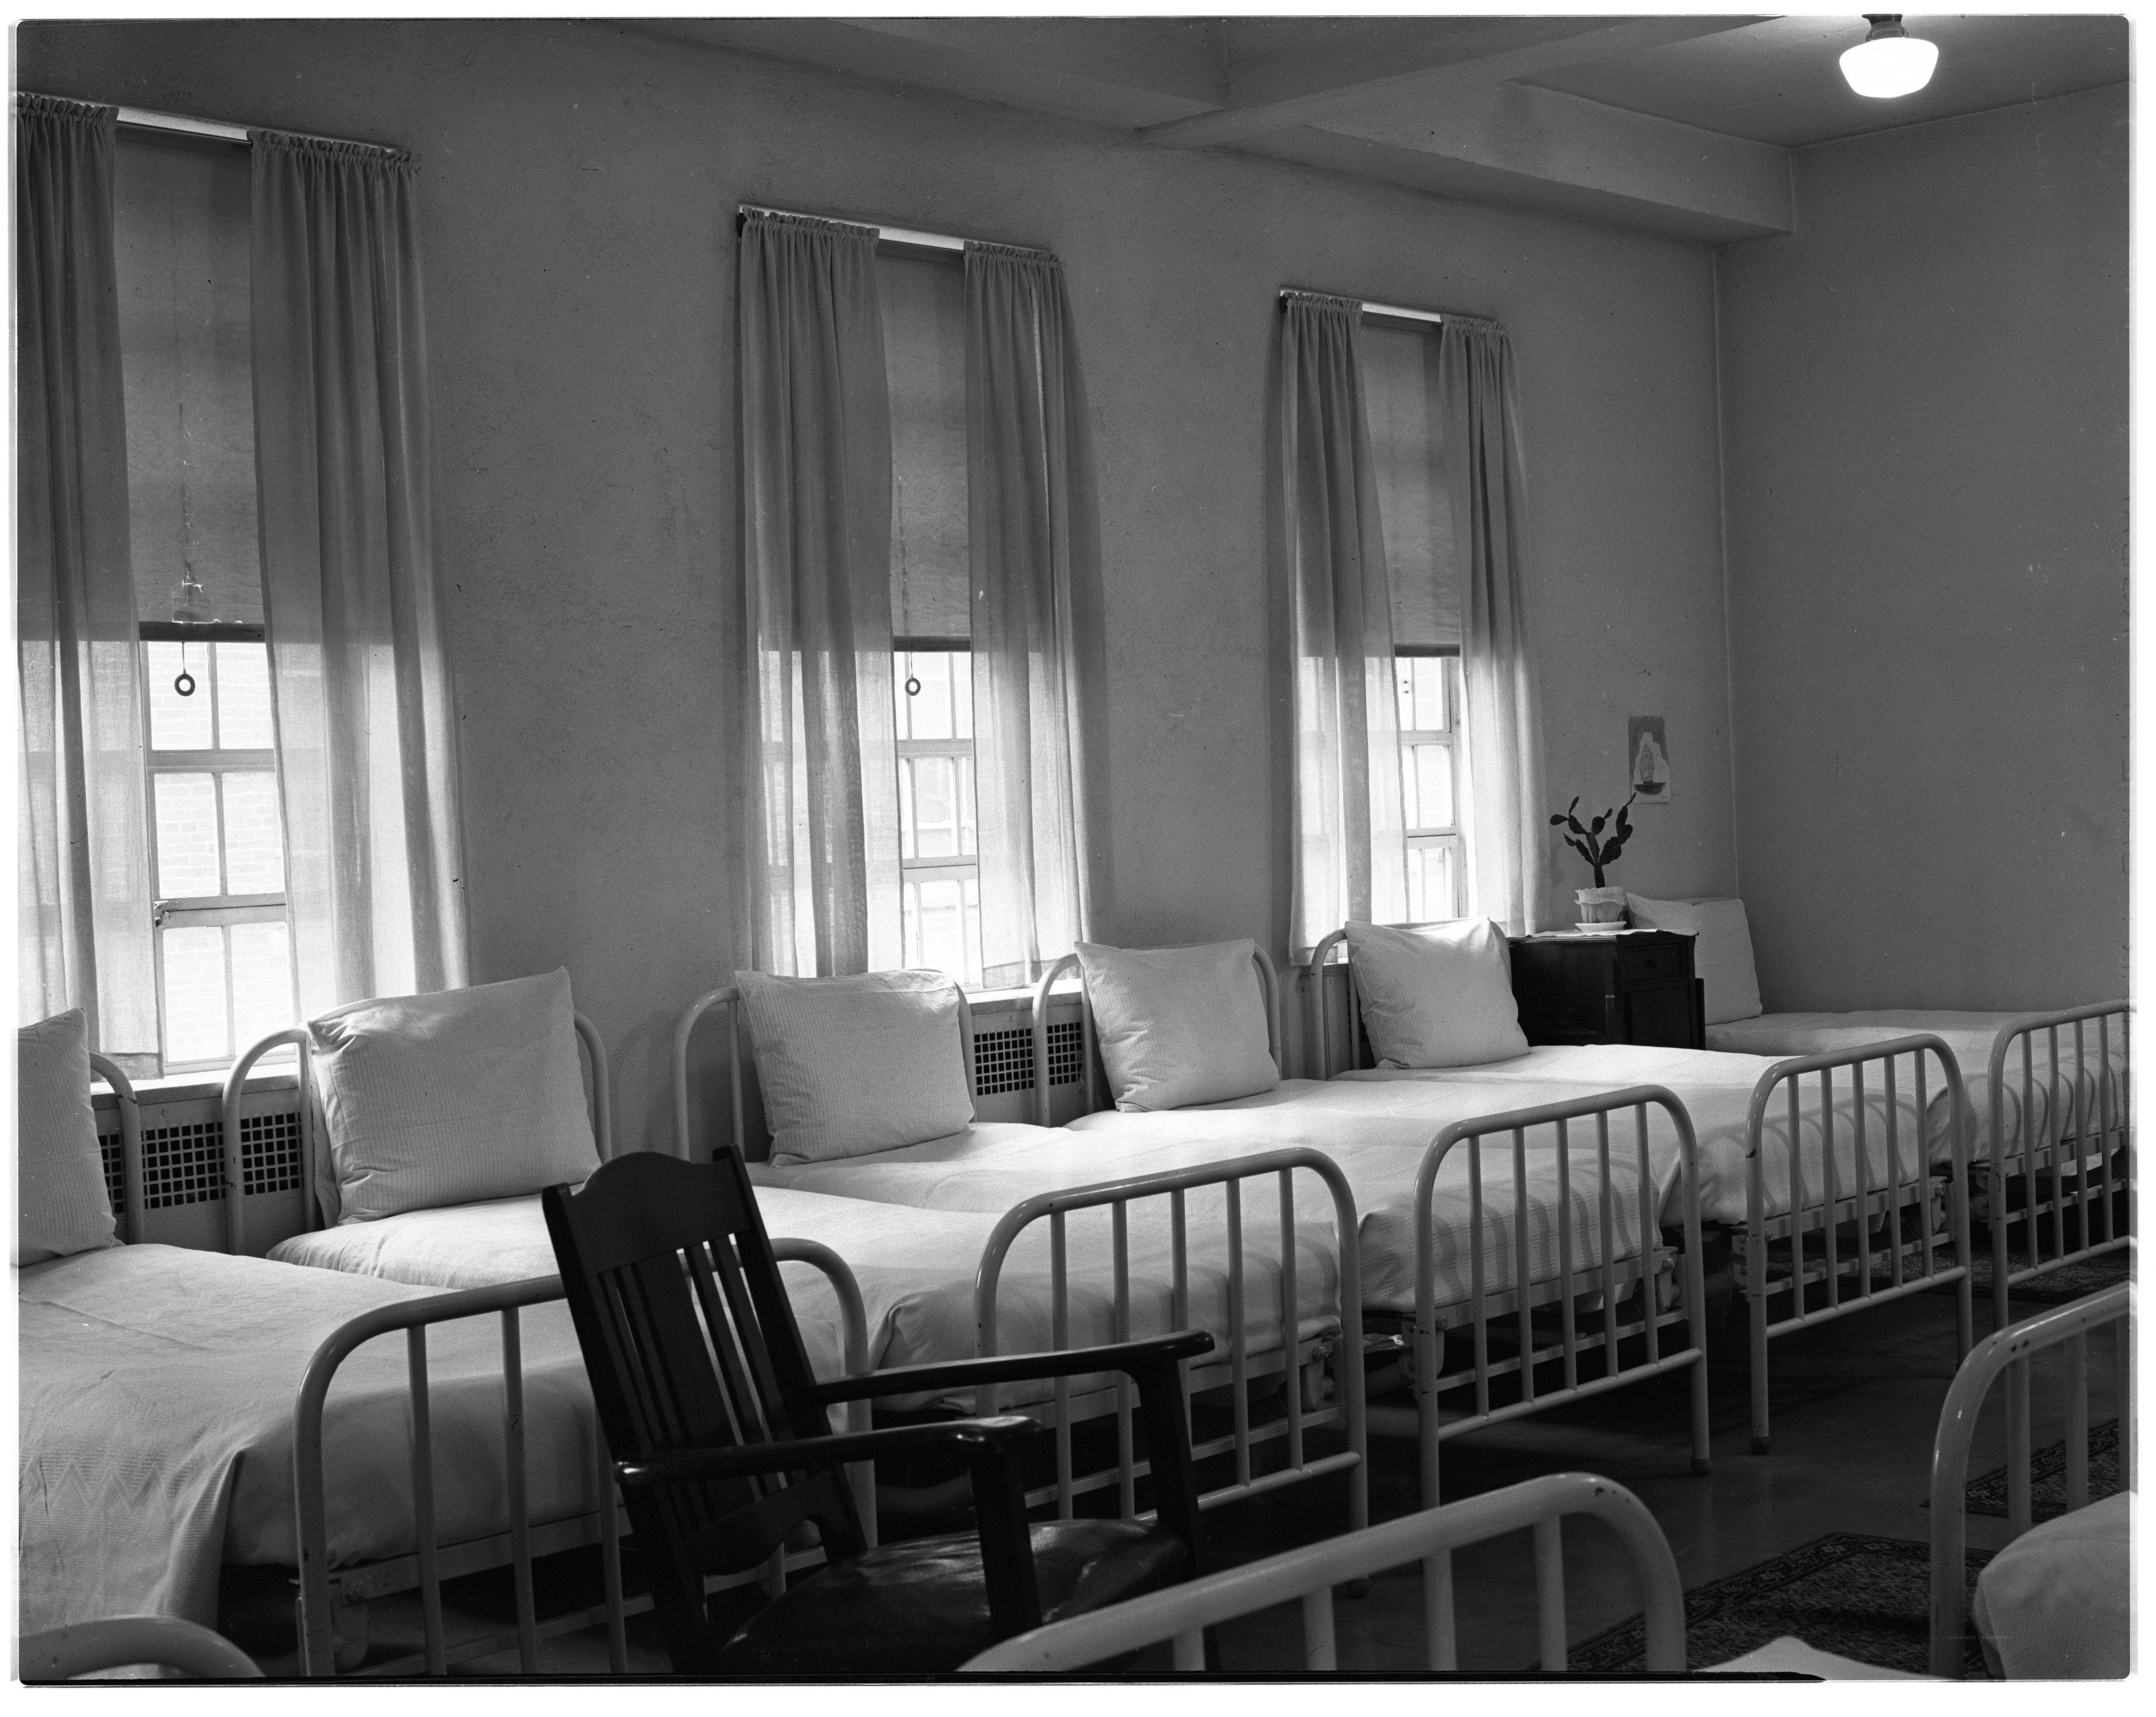 Pin by TONYAN on 悬崖内景 Room, Furniture, Hospital room